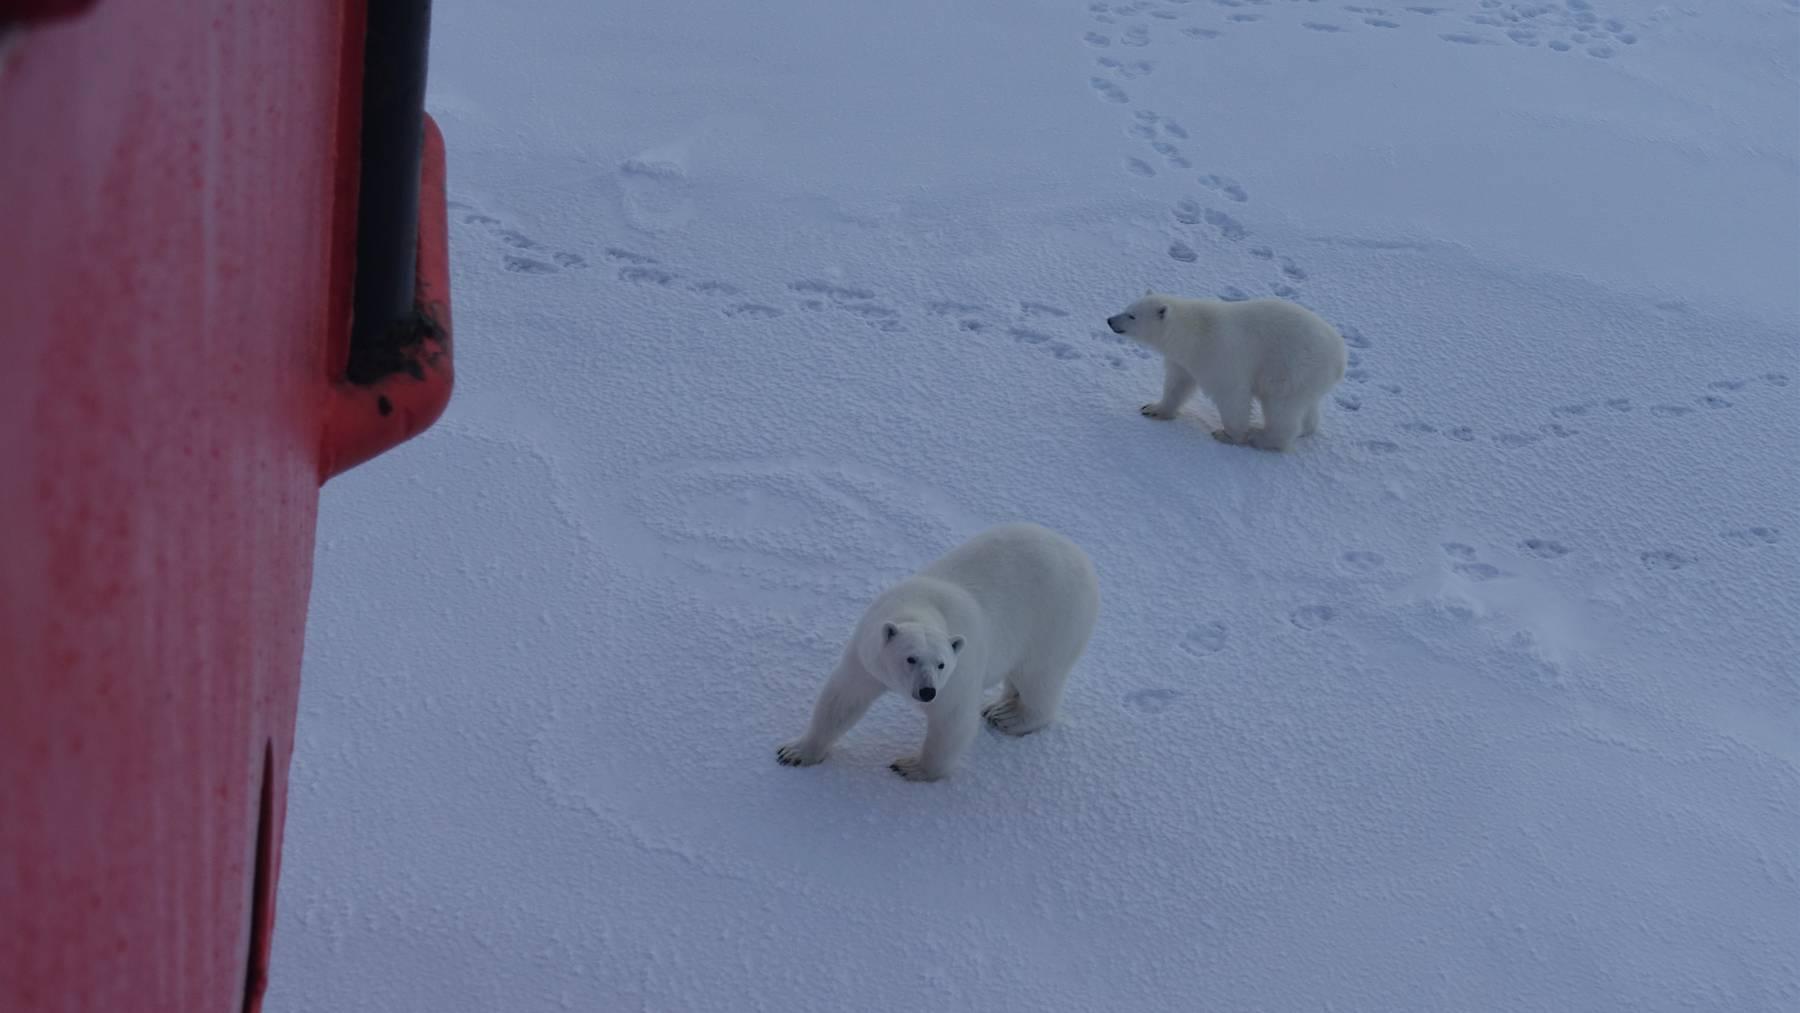 Mosaic-Expedition Arktis - Mauro Hermann